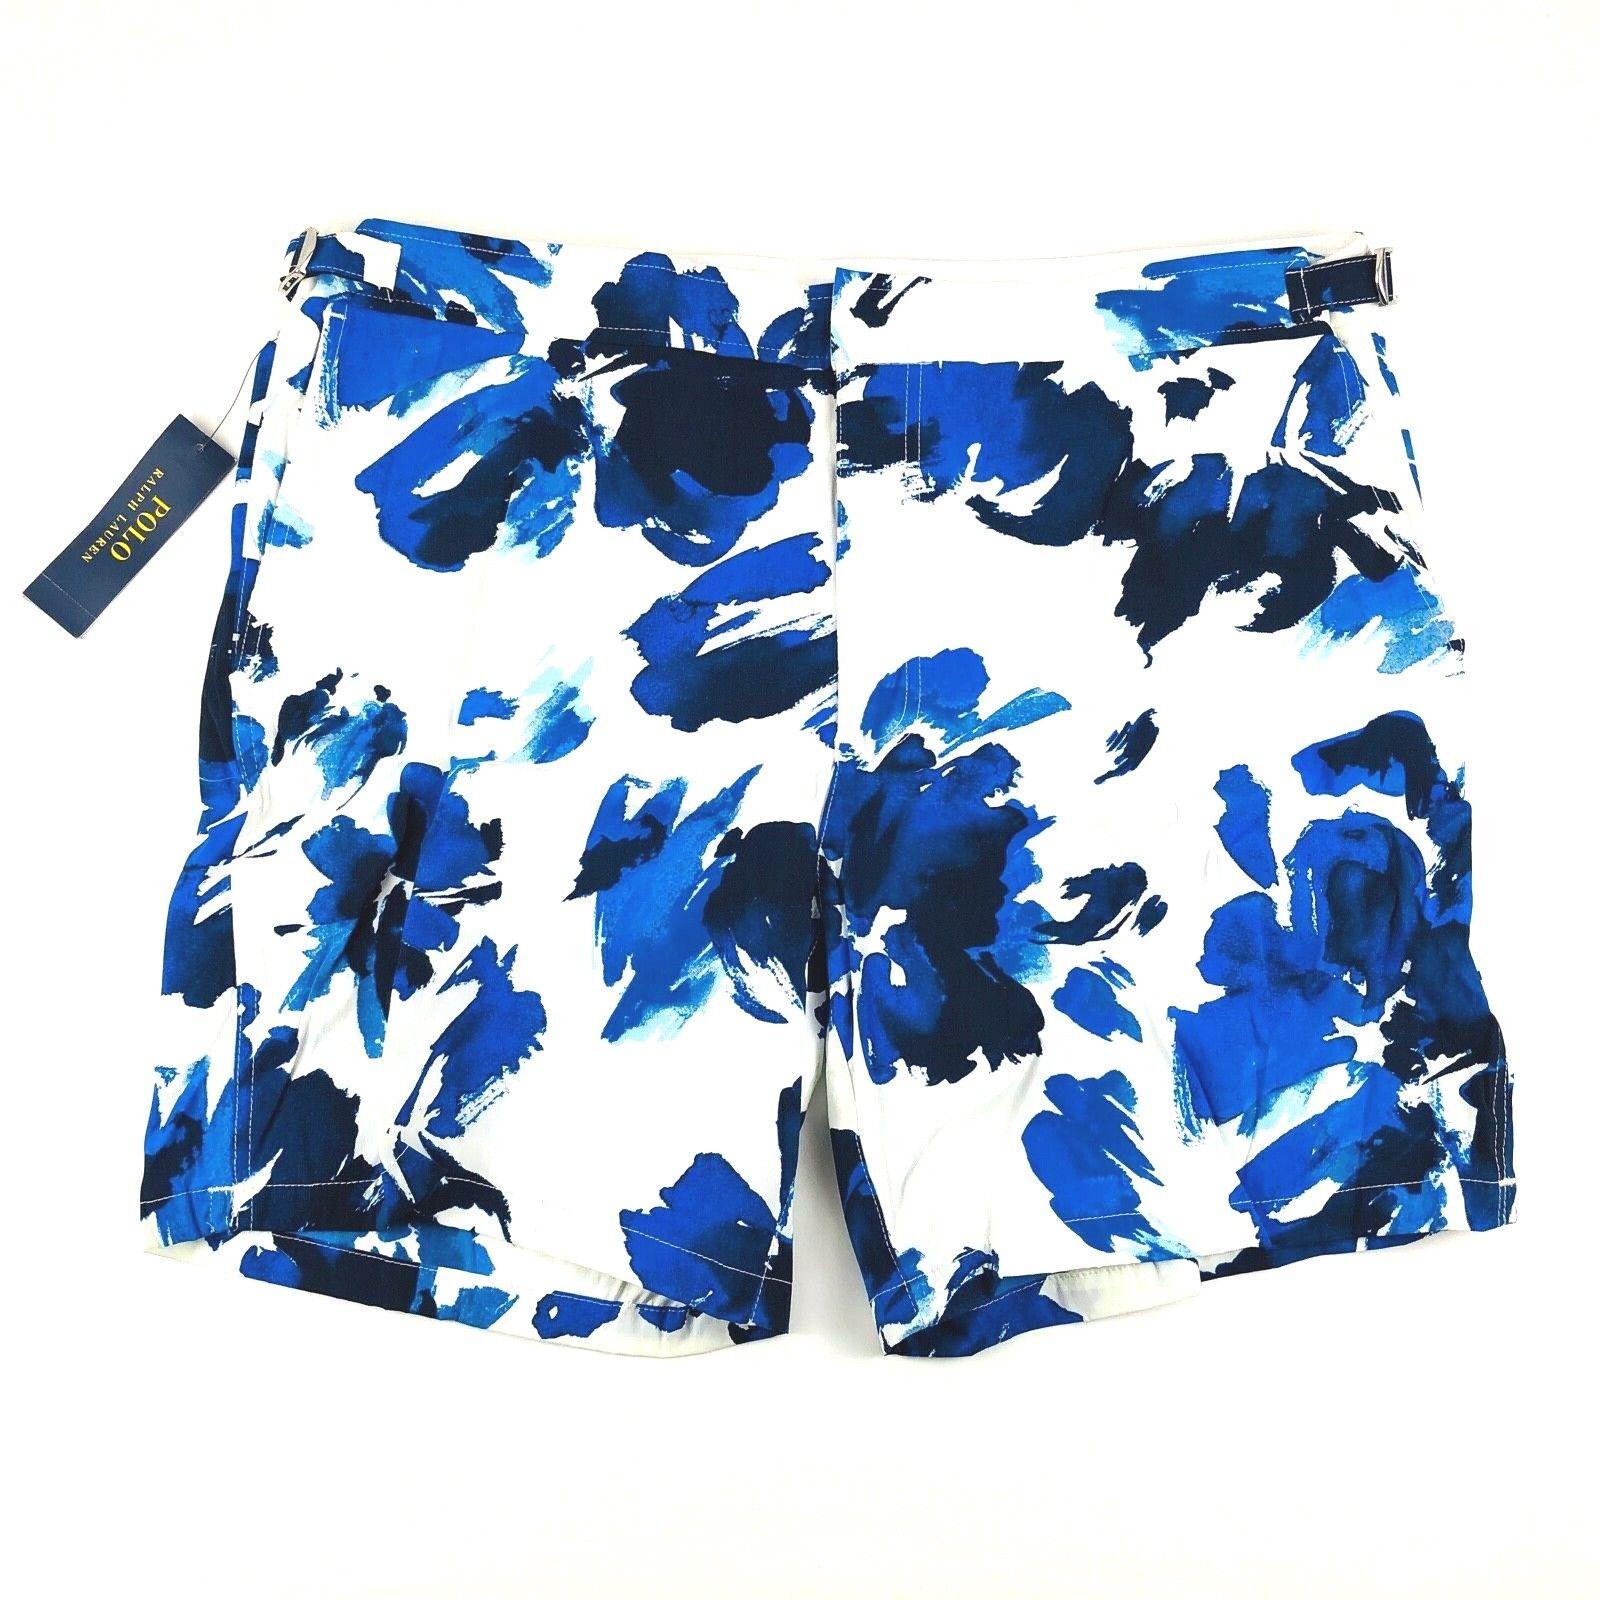 2b4c68a86e436 Polo Ralph Lauren Navy White Print Inch Monaco Swim Trunks Mens 38 40 42 36  7 nsuixl3867-Swimwear